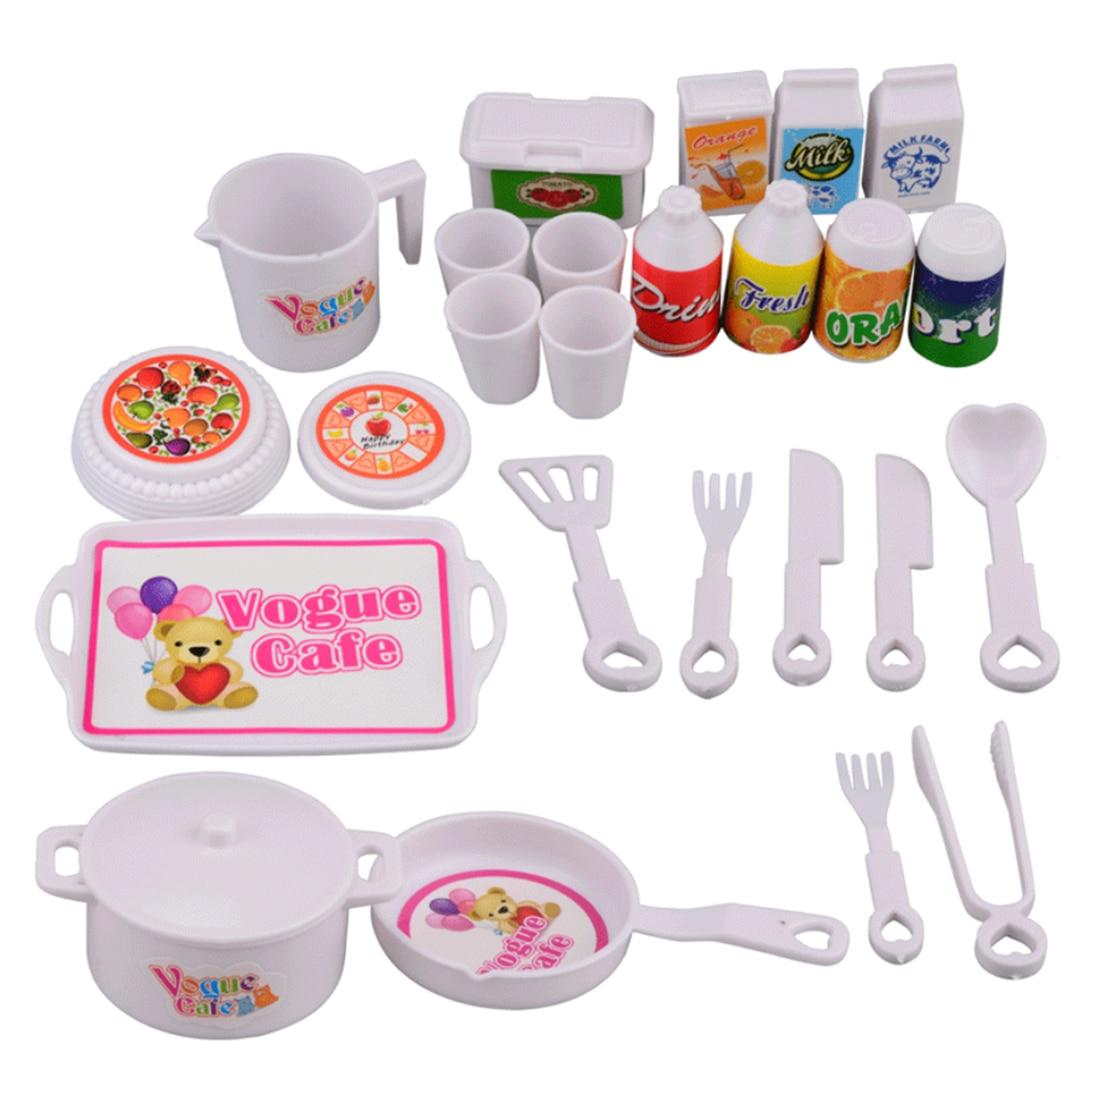 25Pcs Children Miniature Girls Mini Kitchen Toy Dish Set Pretend Play SimulationTableware Set Kids Cutlery Boys Education Skill